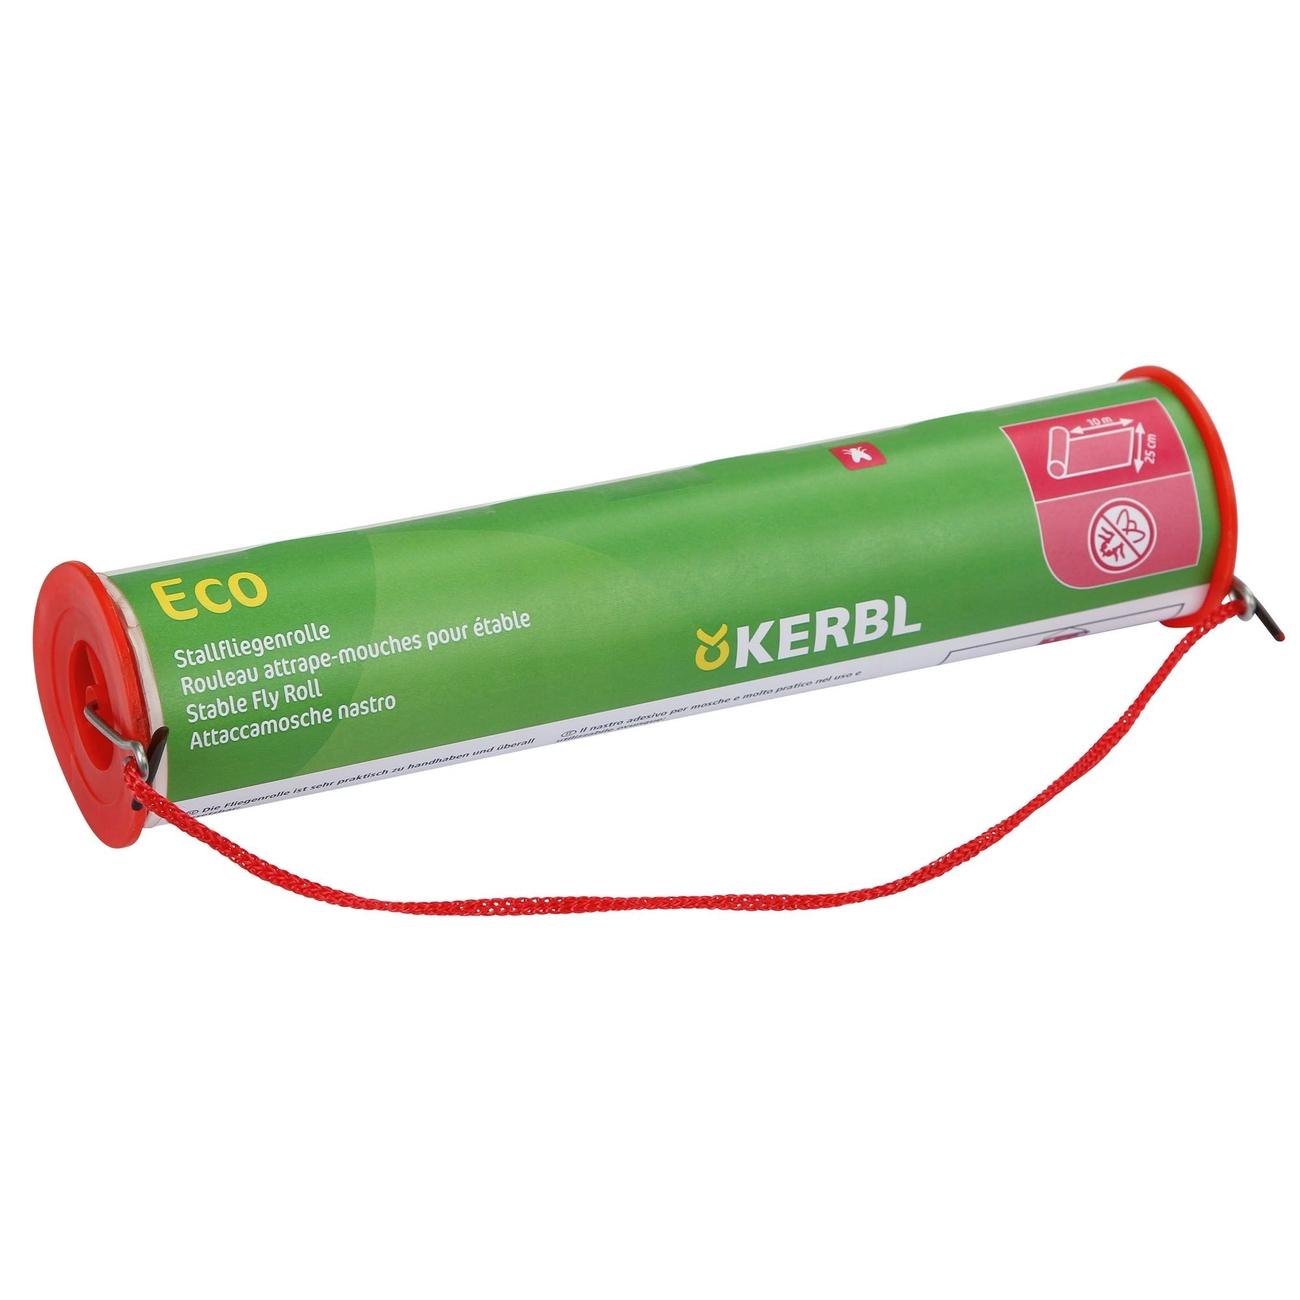 Kerbl Stallfliegenrolle Eco, 10 m lang x 25 cm breit